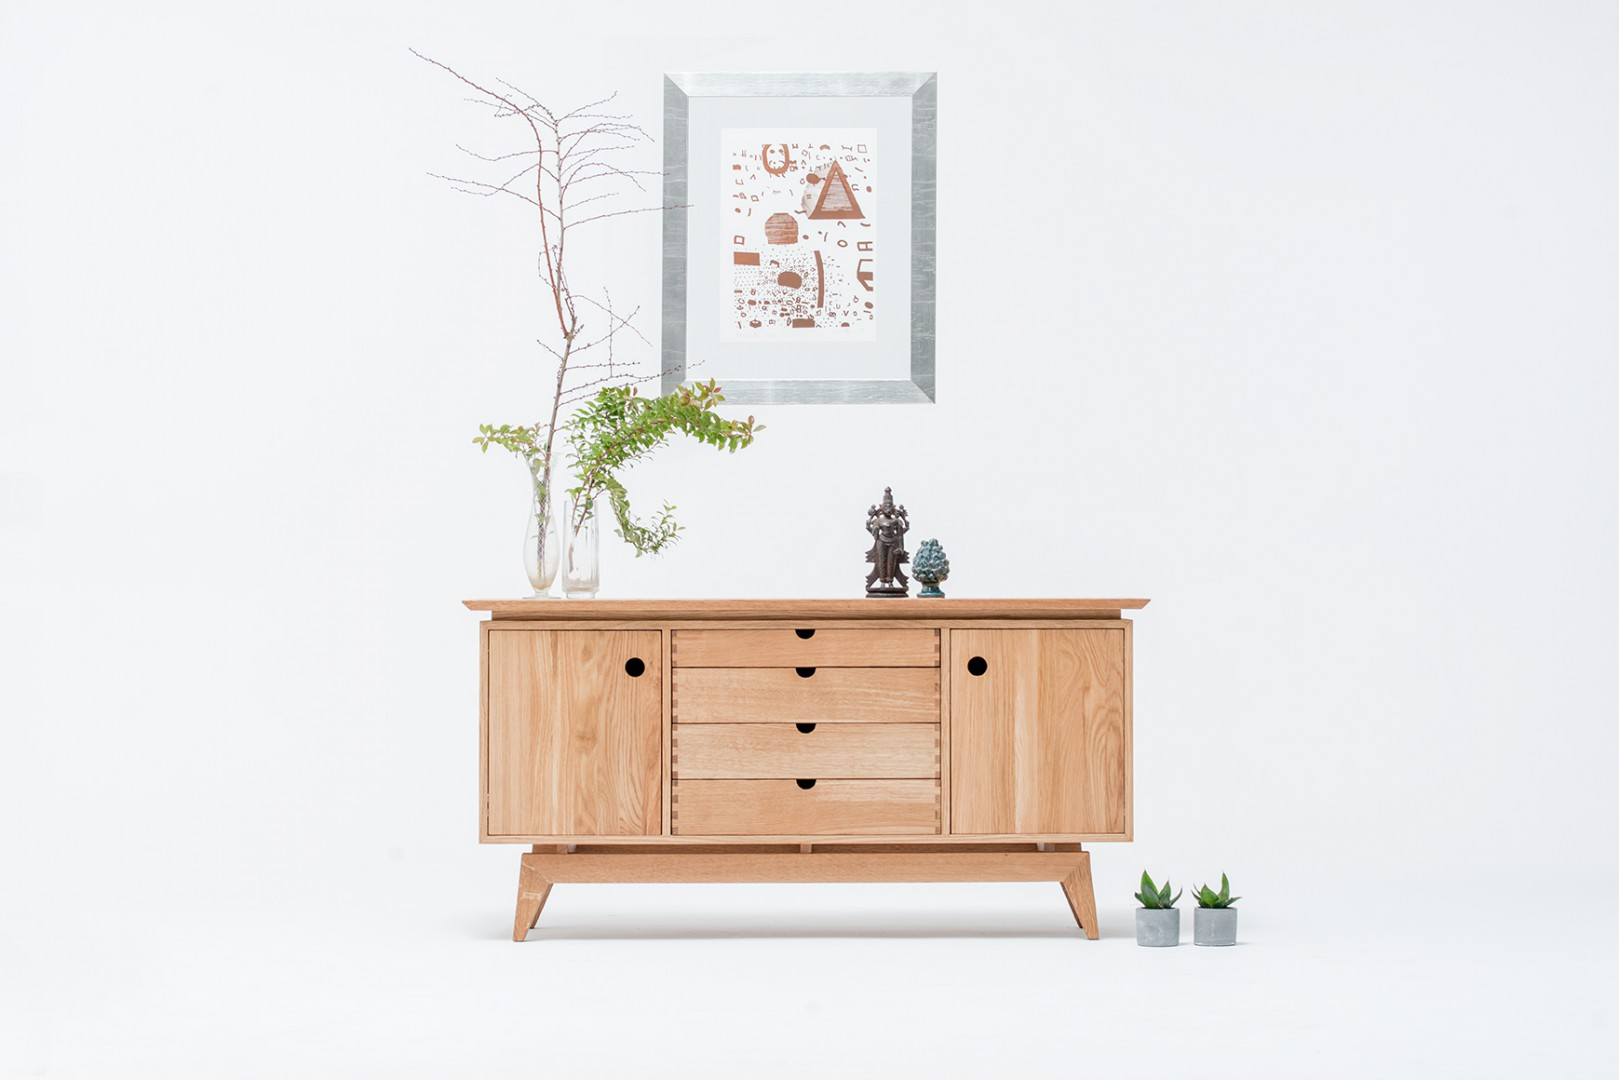 Komoda ST Sideboard marki Swallow's Tail Furniture. Fot. Euforma